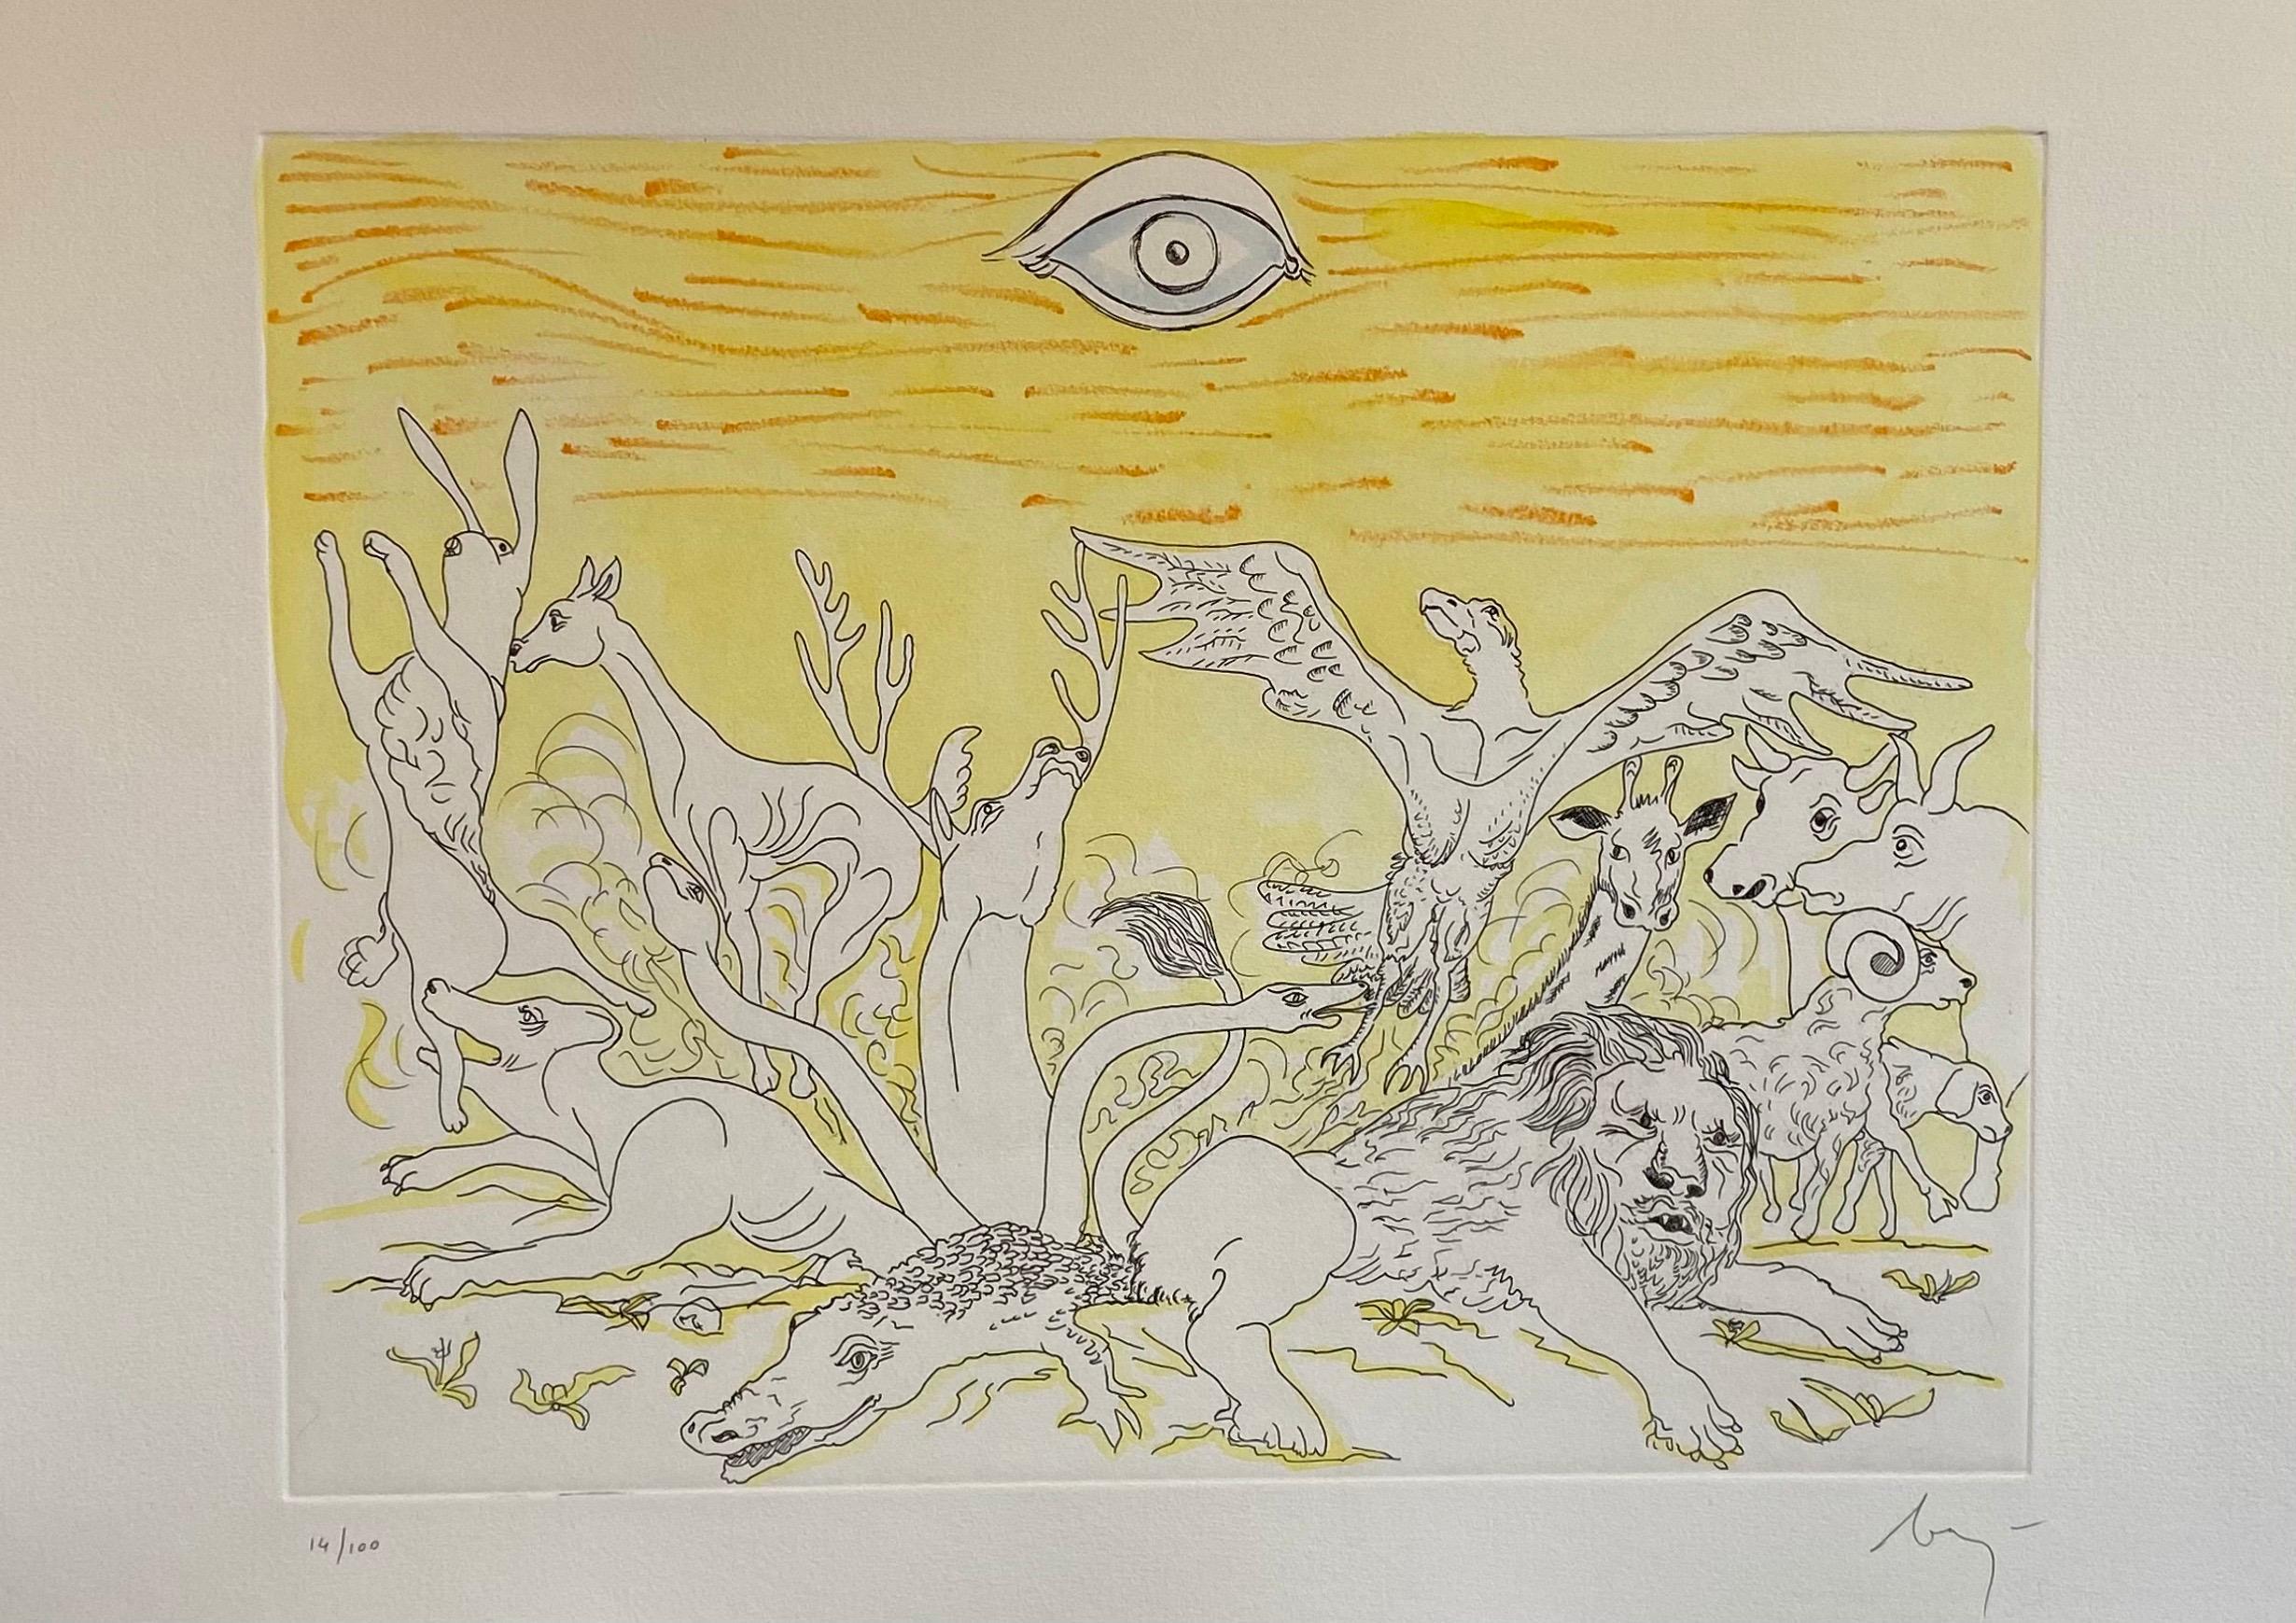 Italian Surrealist Aquatint Etching Enrico Baj Pop Art with Watercolor Painting